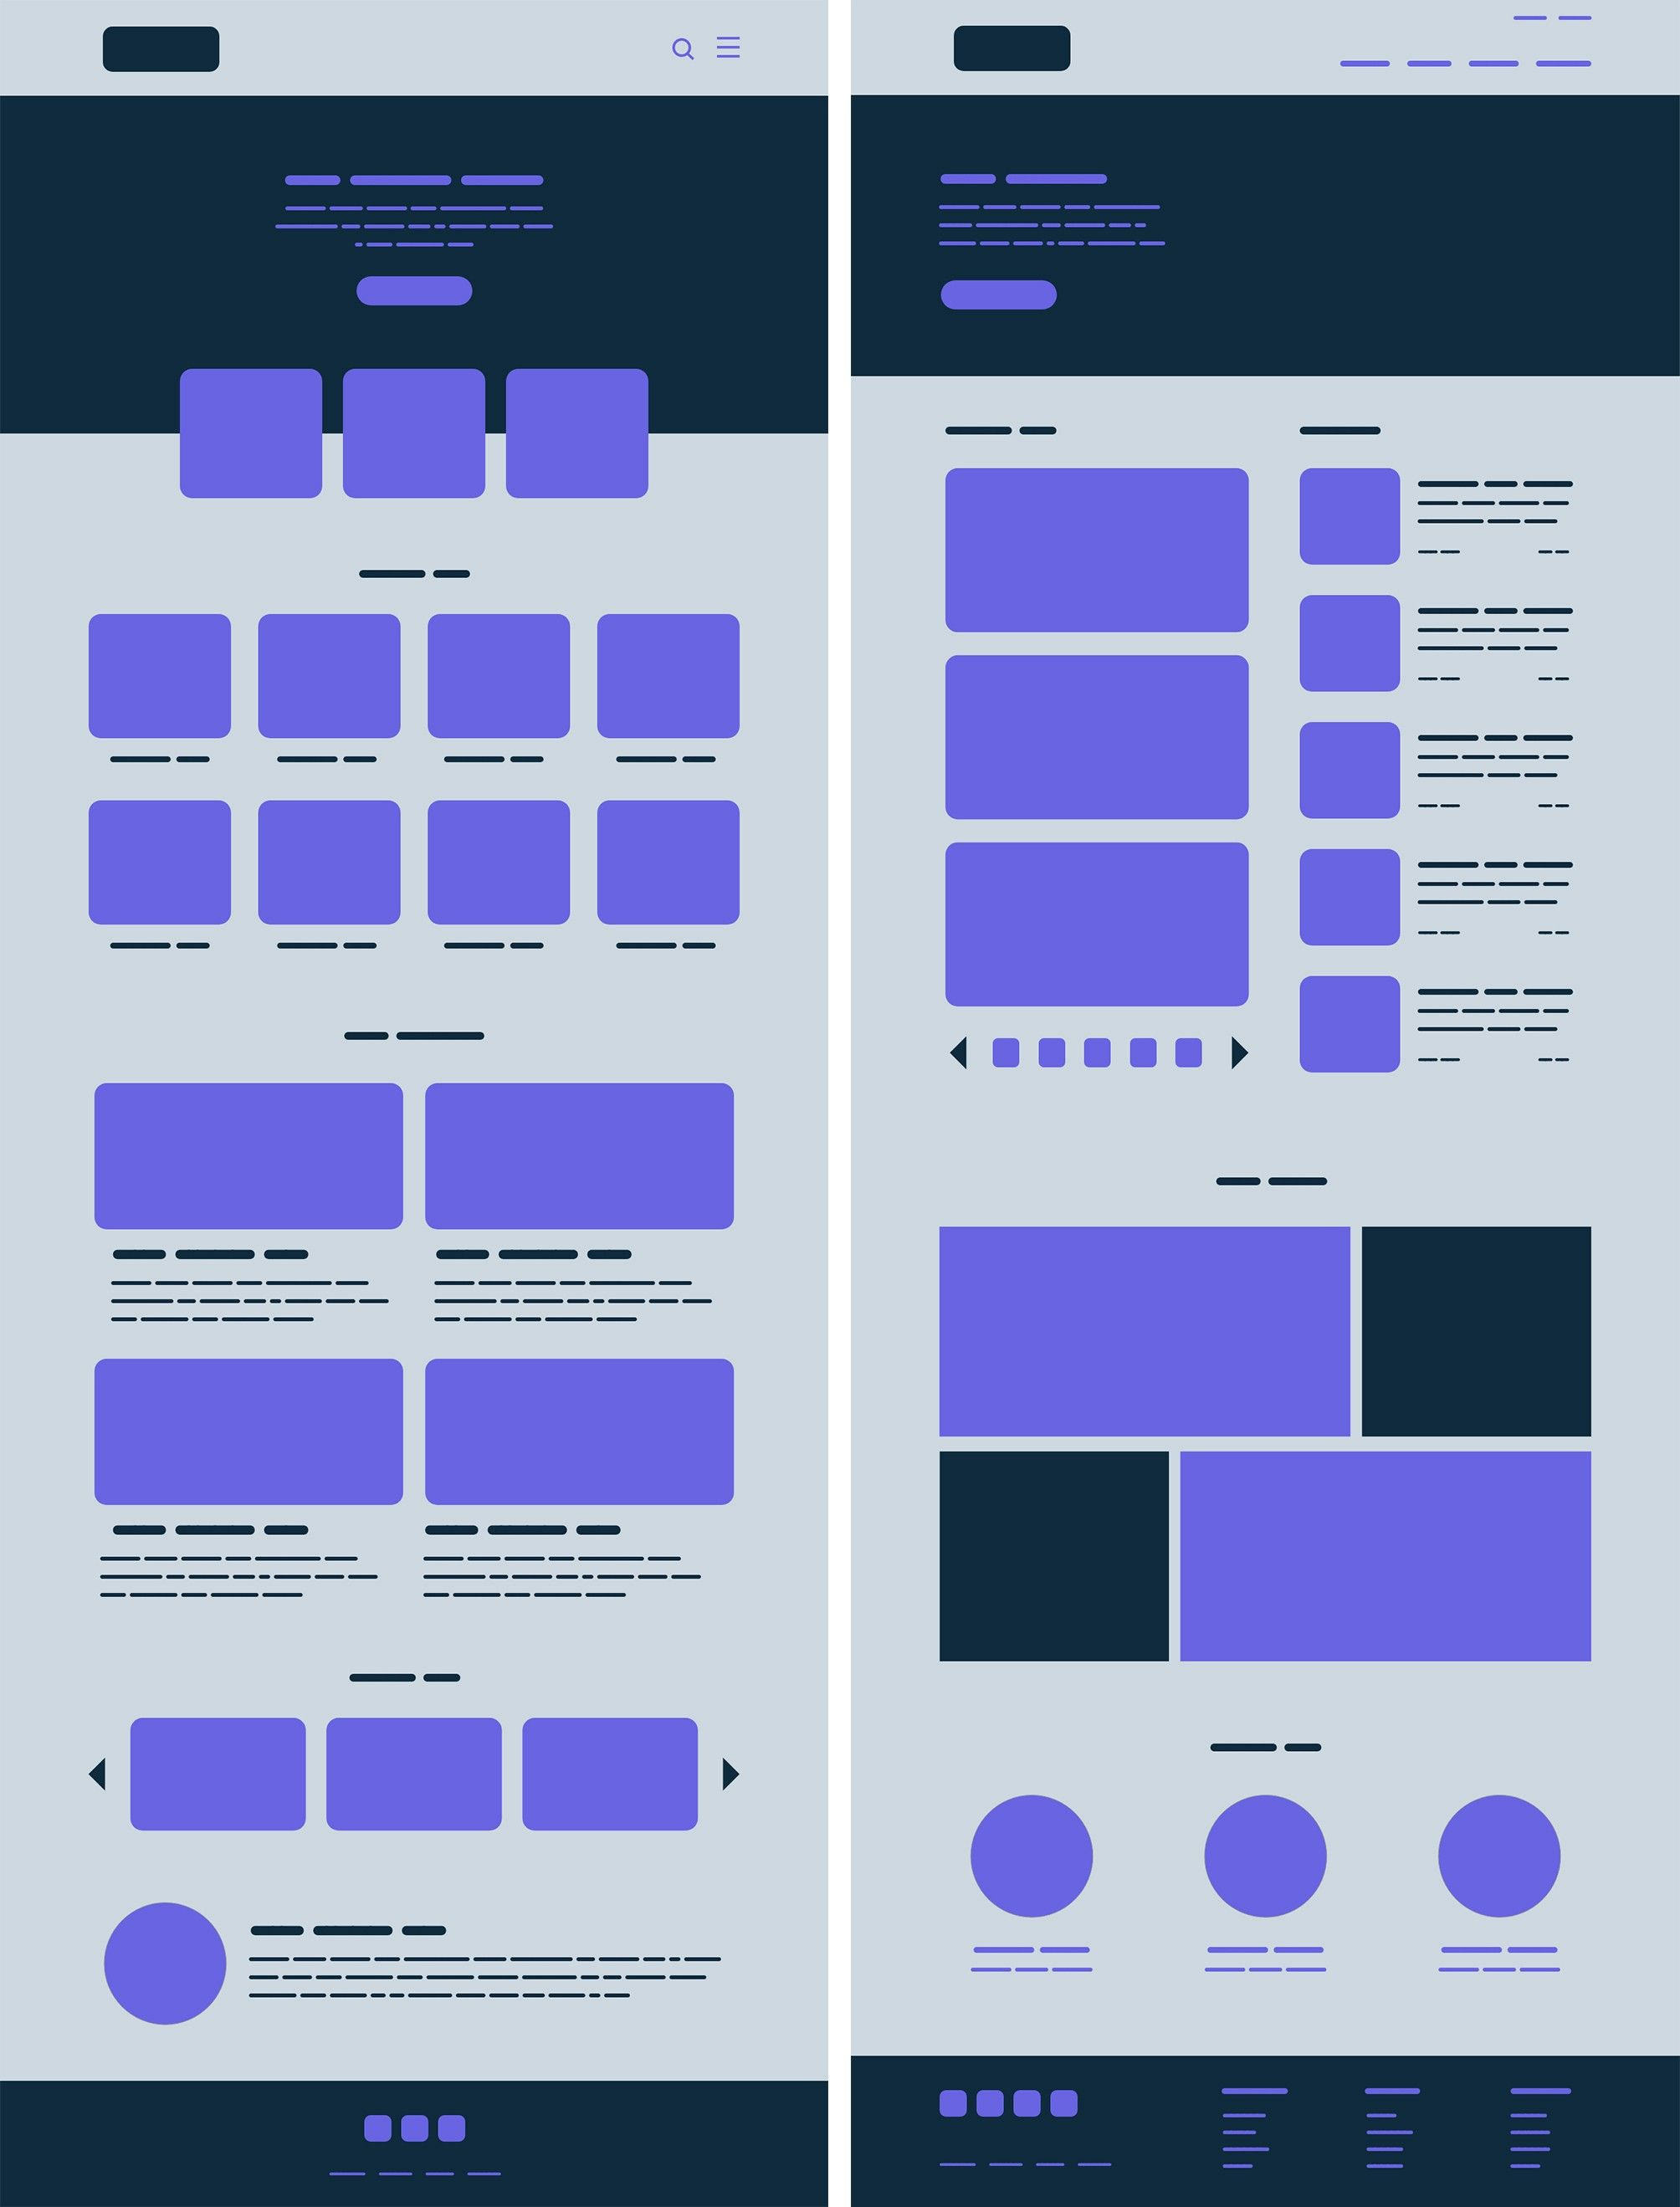 Gestalt principles in UI design.